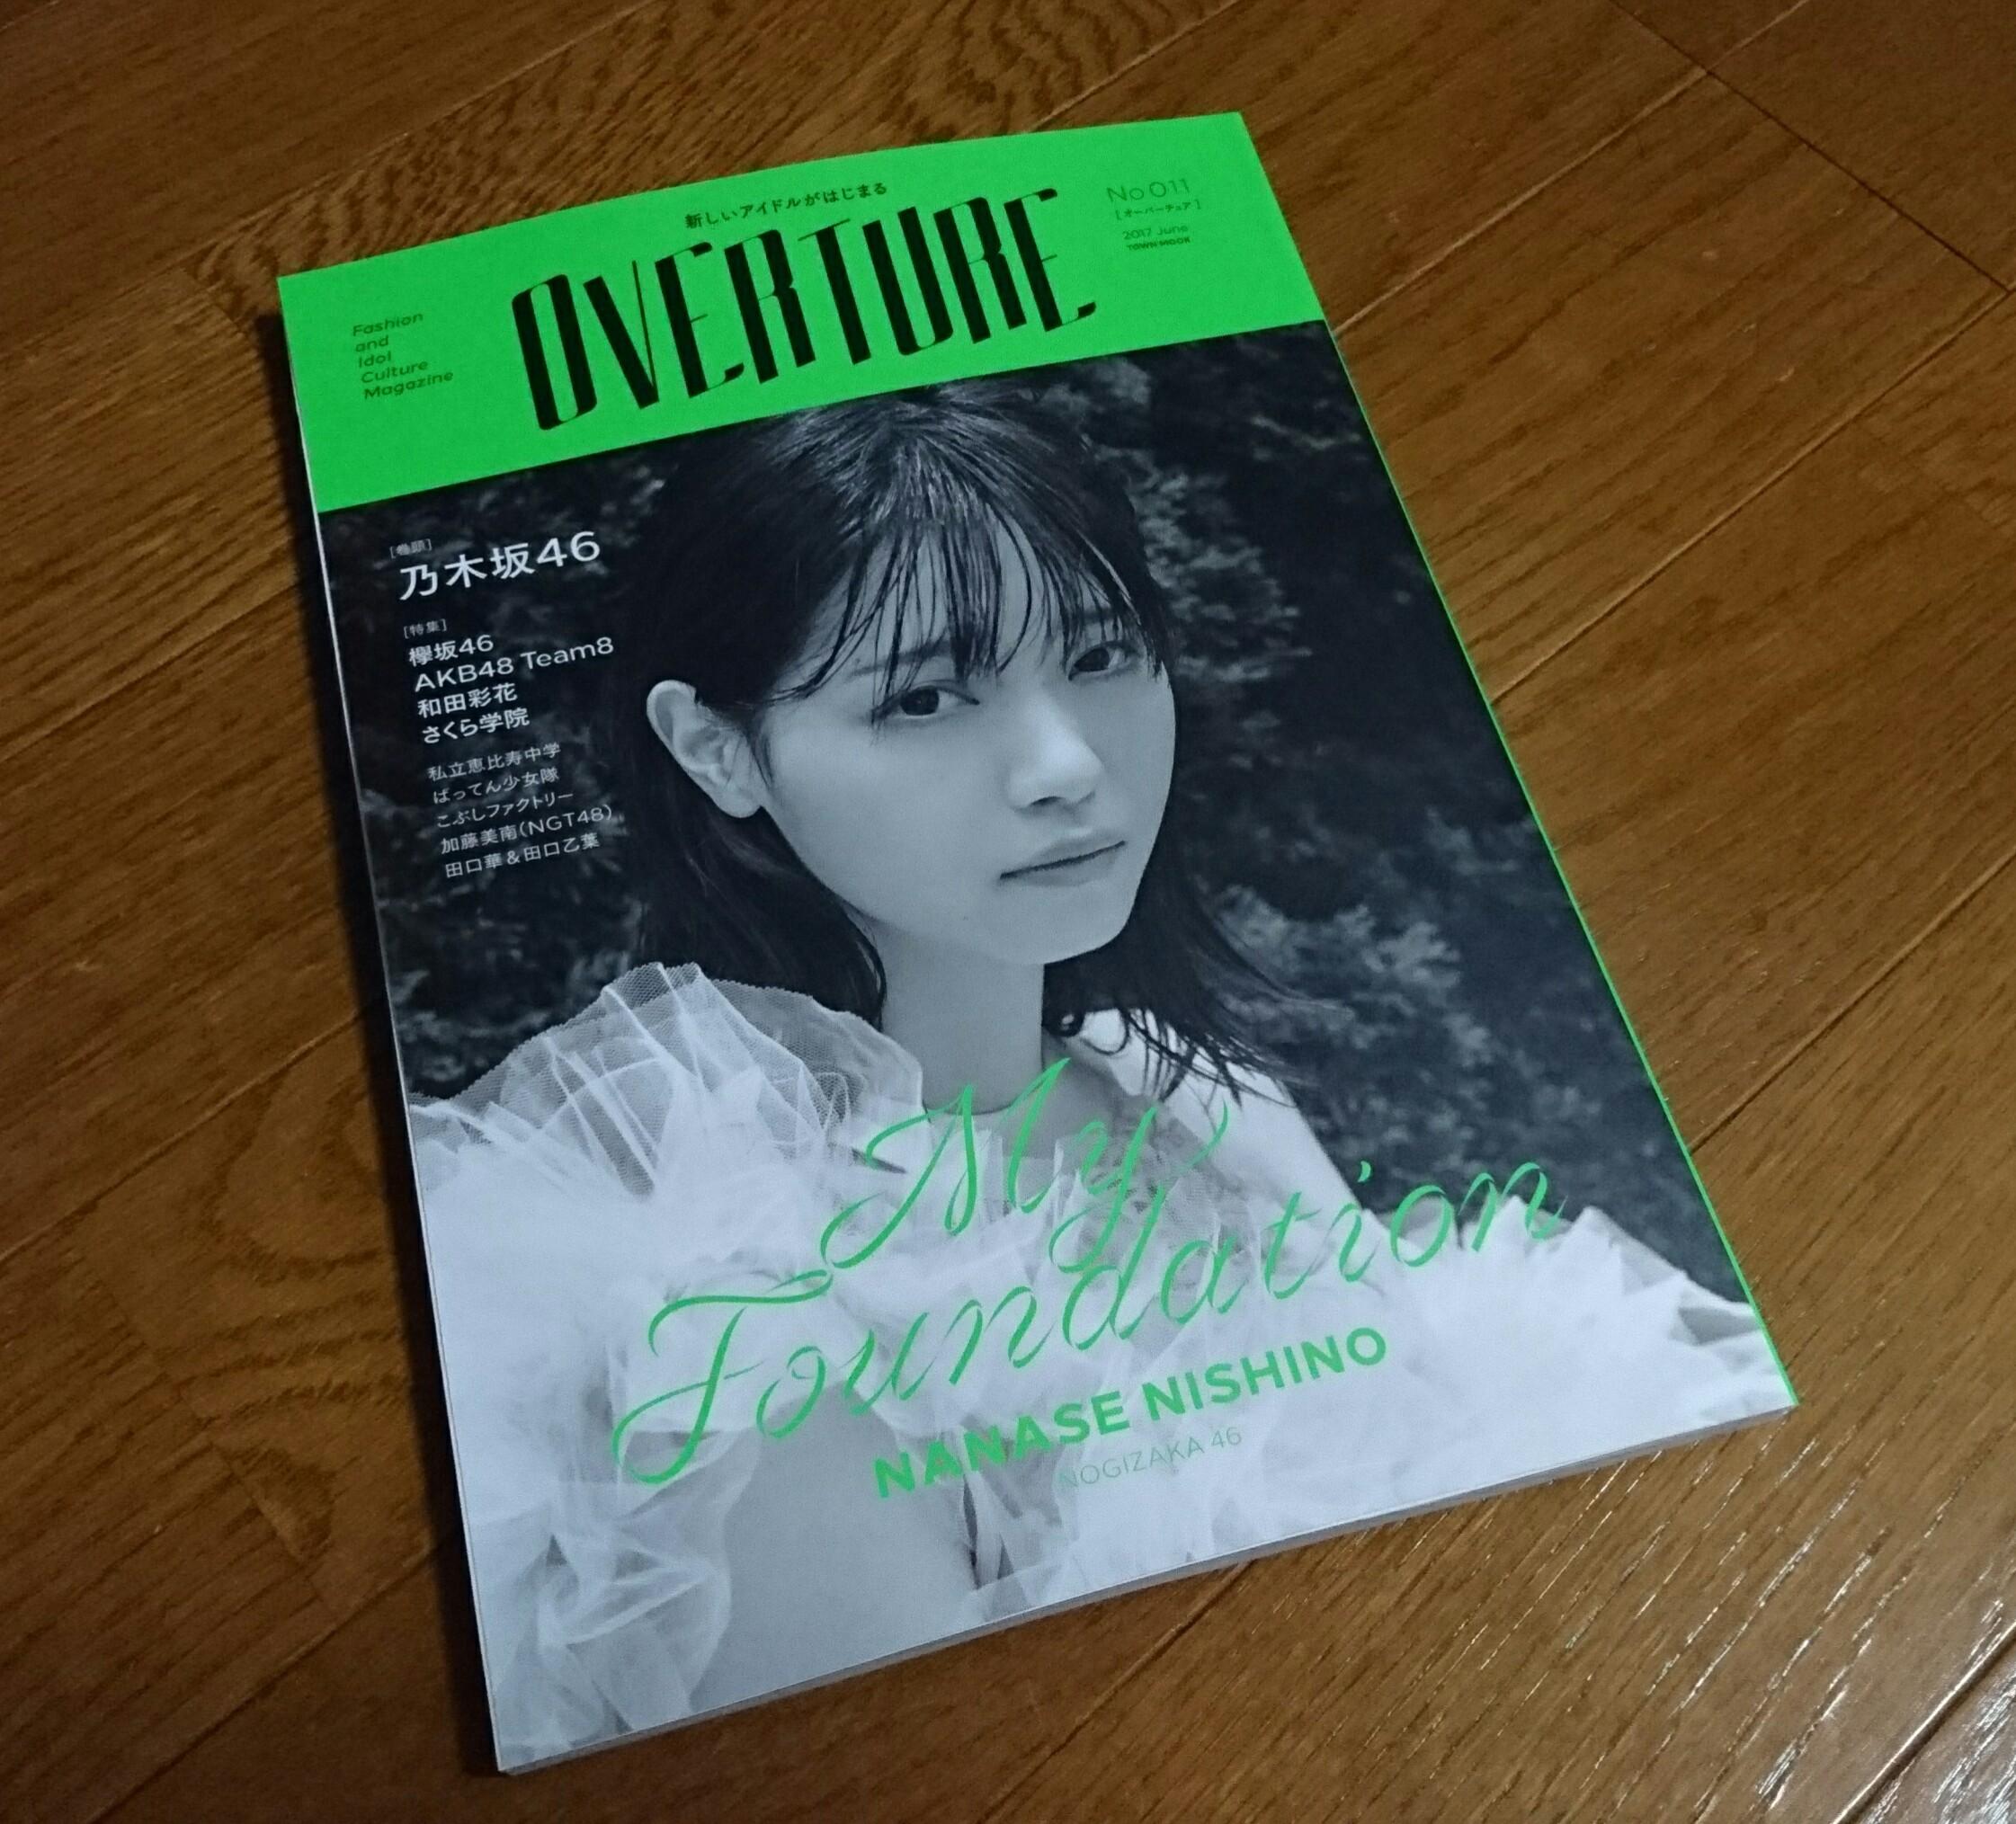 OVERTURE,西野七瀬,乃木坂46,20170620,雑誌,白黒,モノクロ